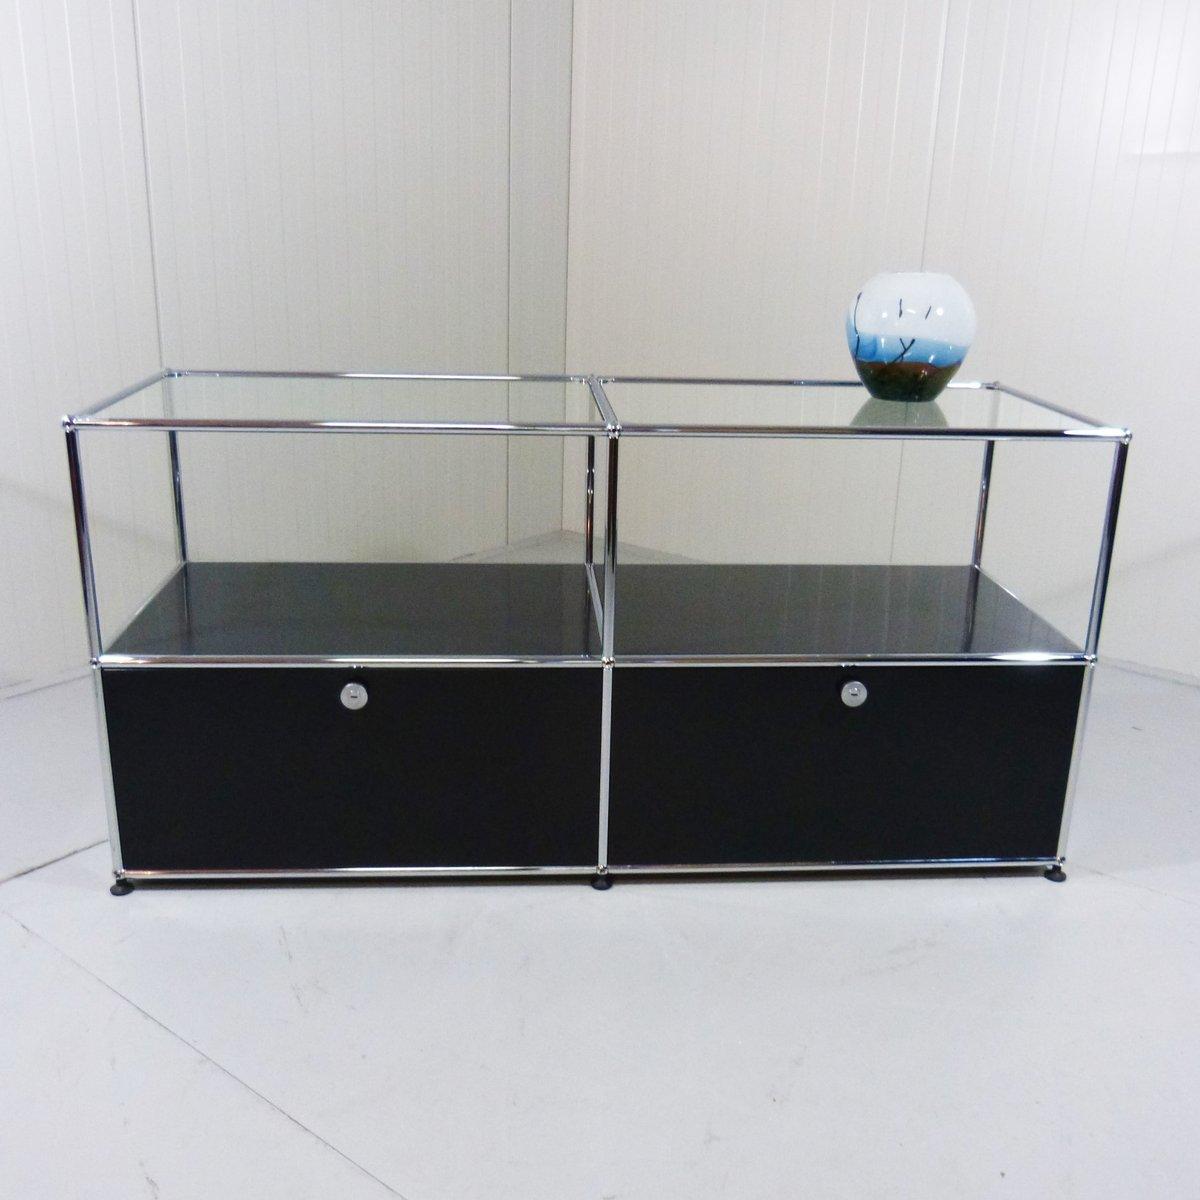 modulares sideboard system von fritz haller f r usm haller bei pamono kaufen. Black Bedroom Furniture Sets. Home Design Ideas